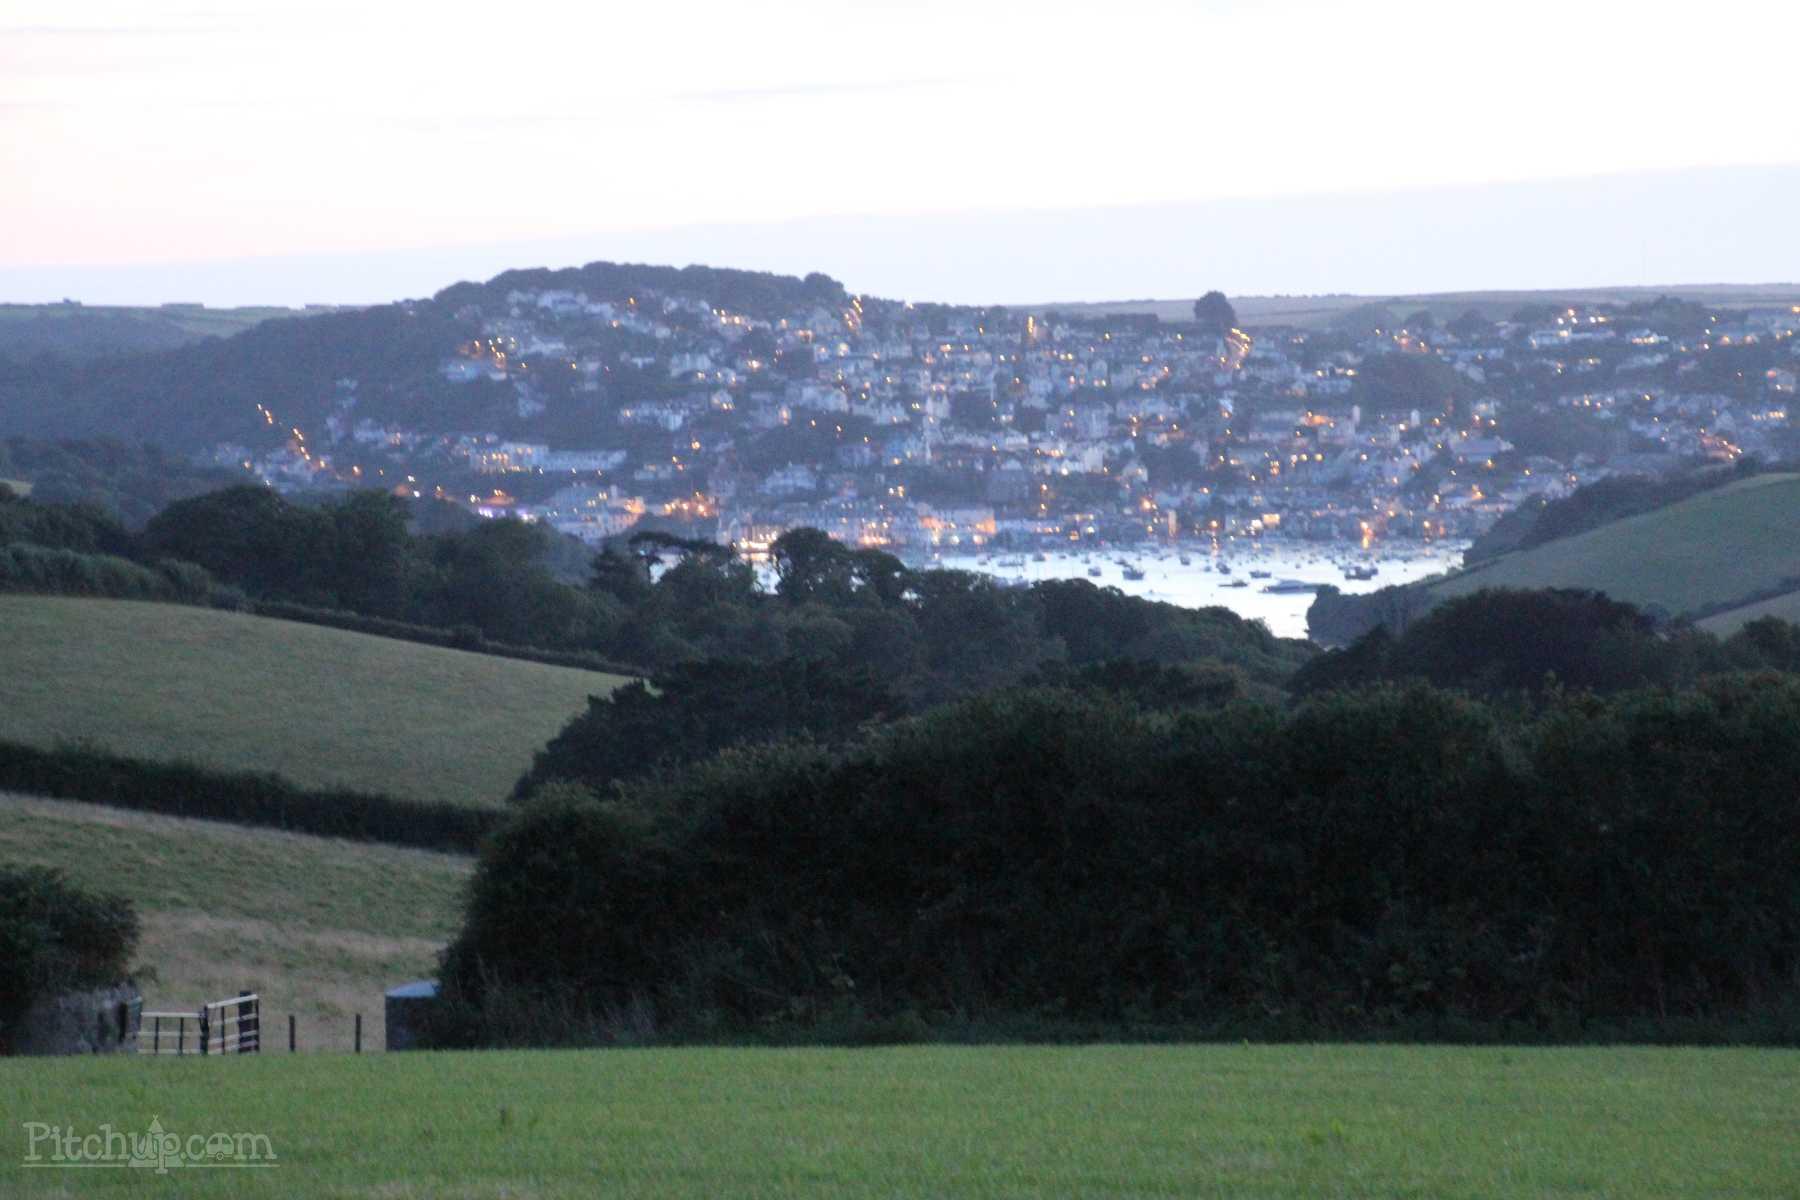 Dusk view to Salcombe from Wilton Farm, a South Devon Campsite